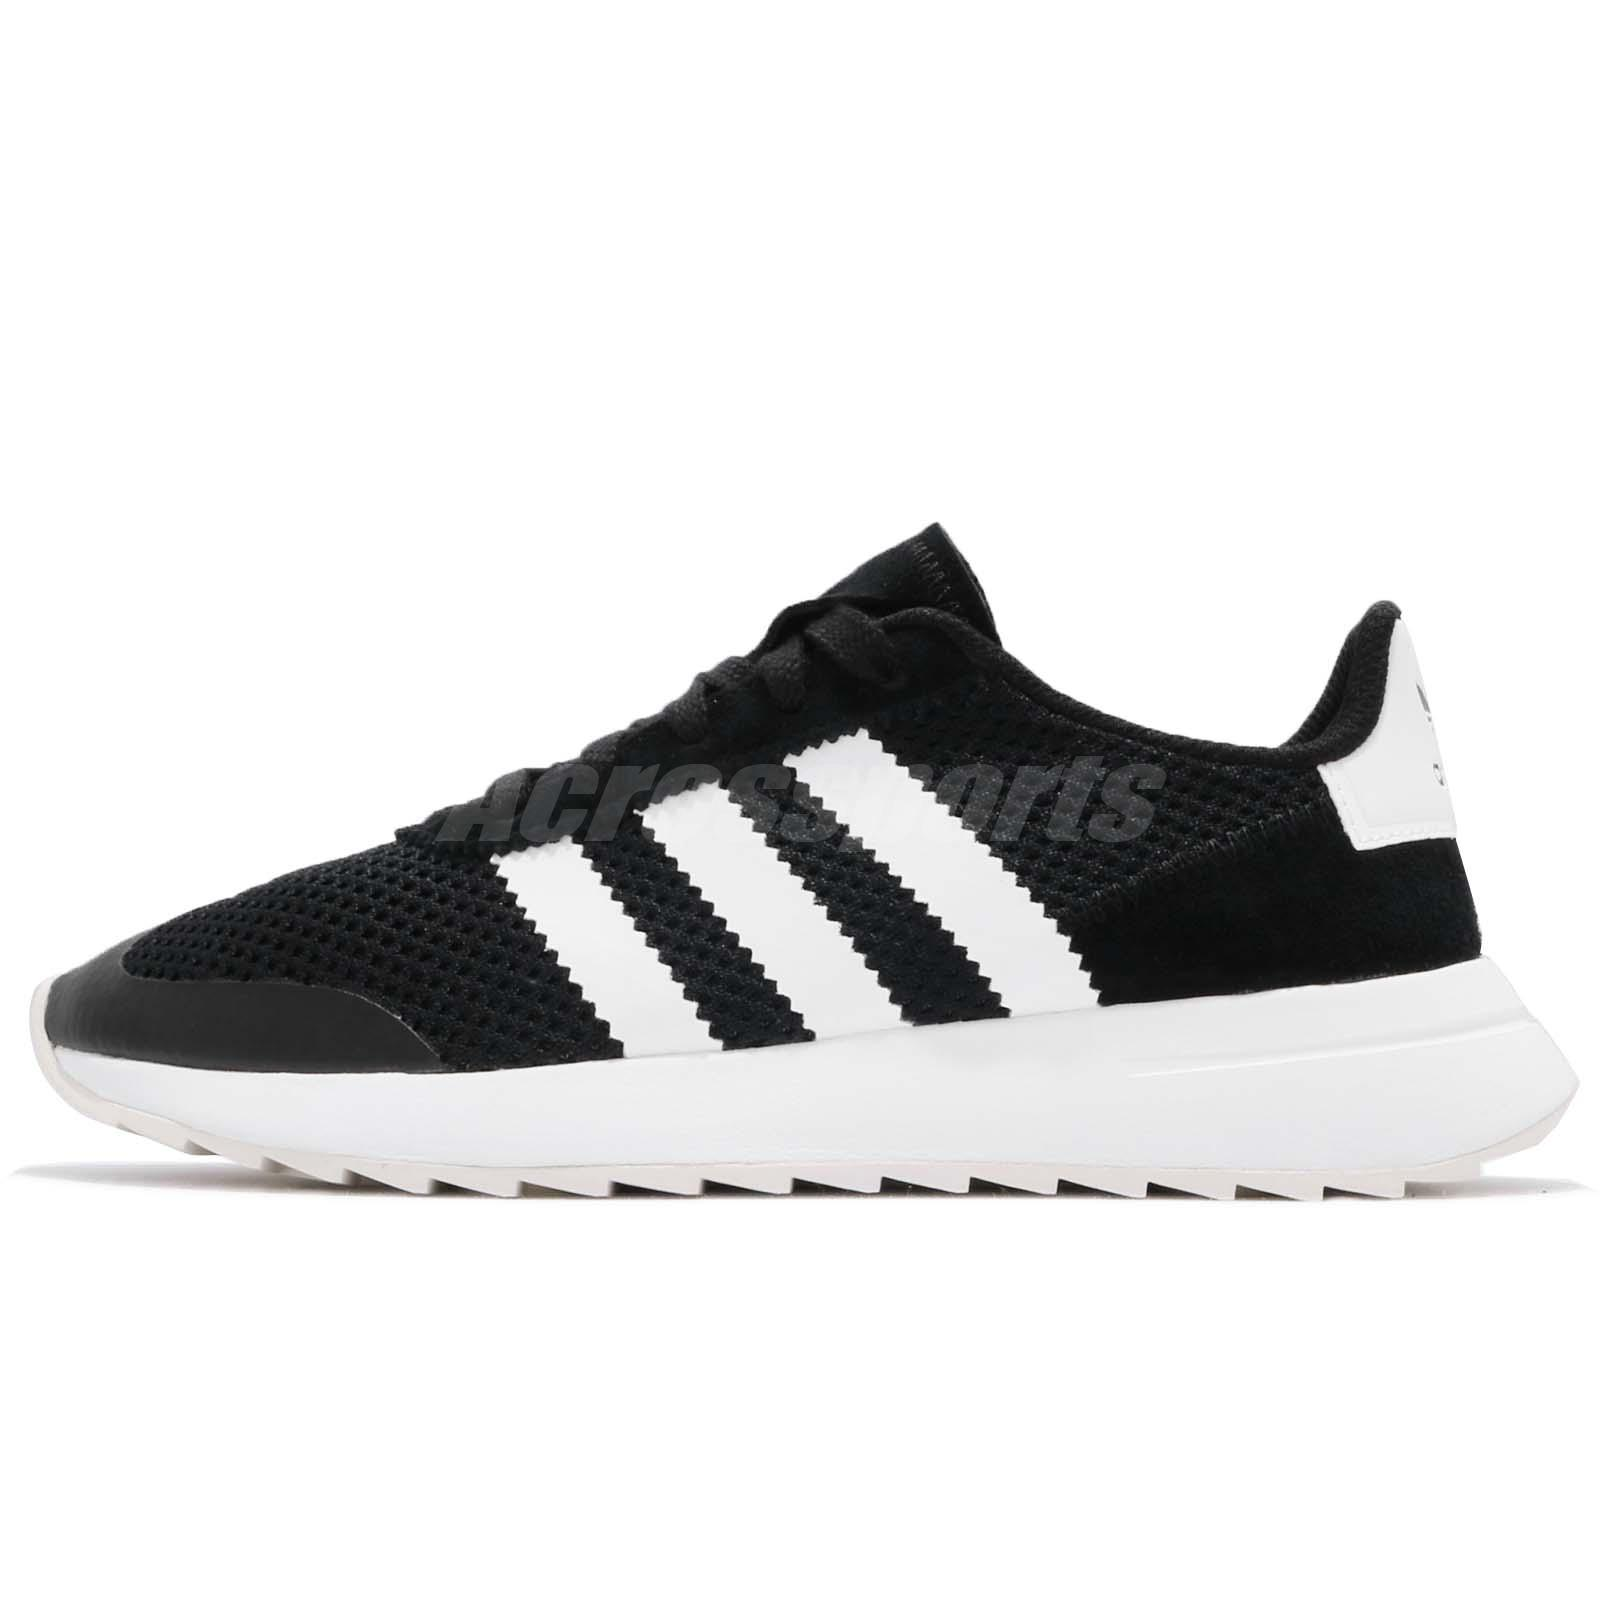 83e47470e81 Details about adidas Originals FLB W Flashback Black White Women Shoes  Sneakers BB5323